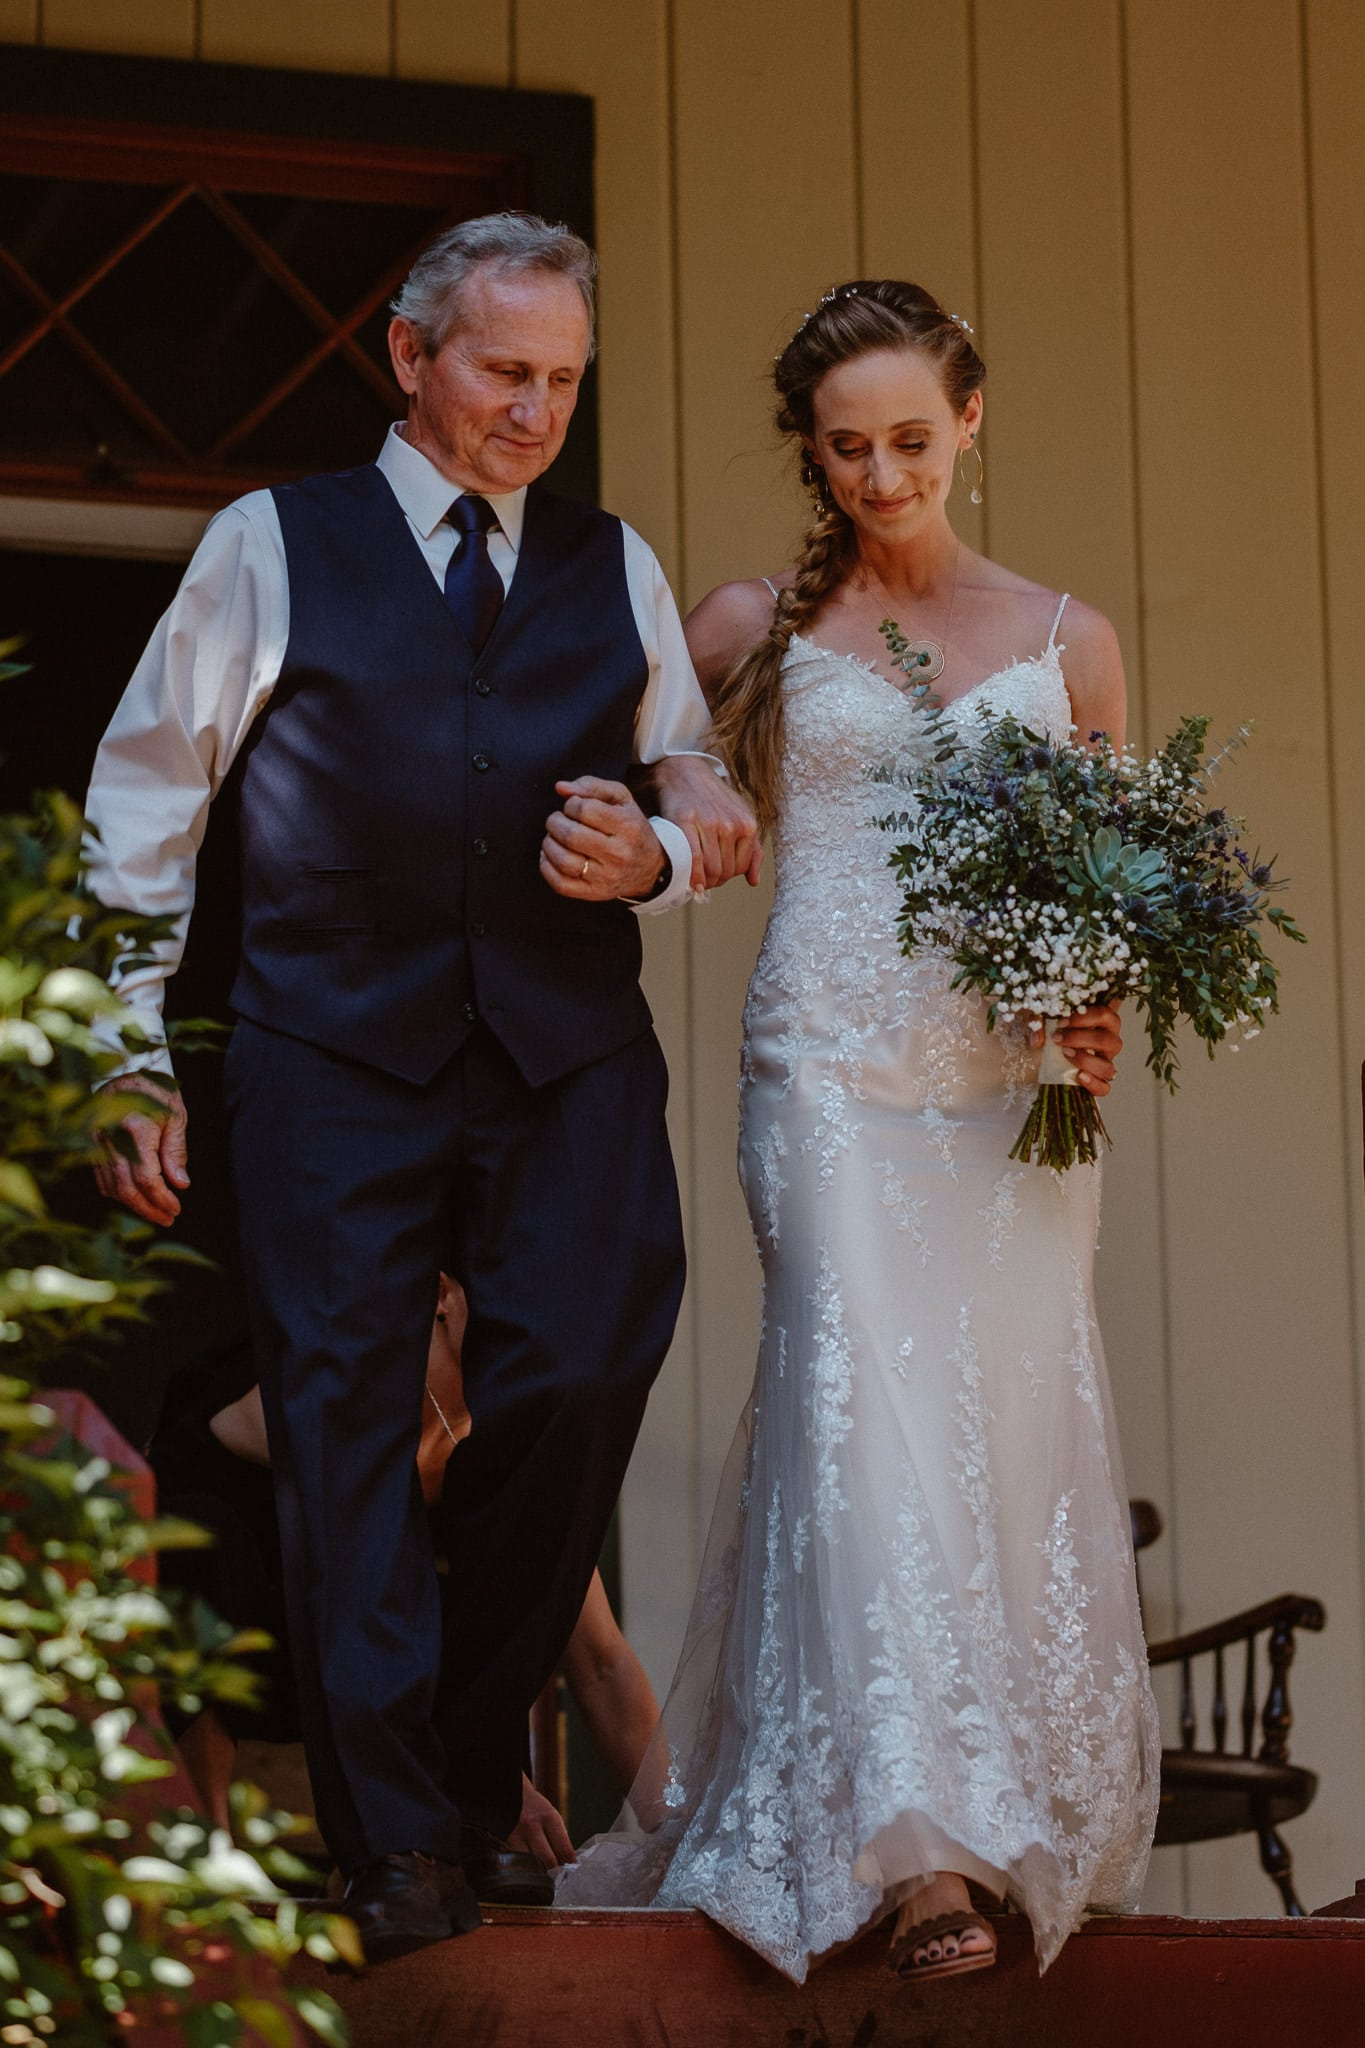 Redstone Inn wedding photographer, Carbondale wedding photographer, Colorado intimate wedding photographer, wedding ceremony processional